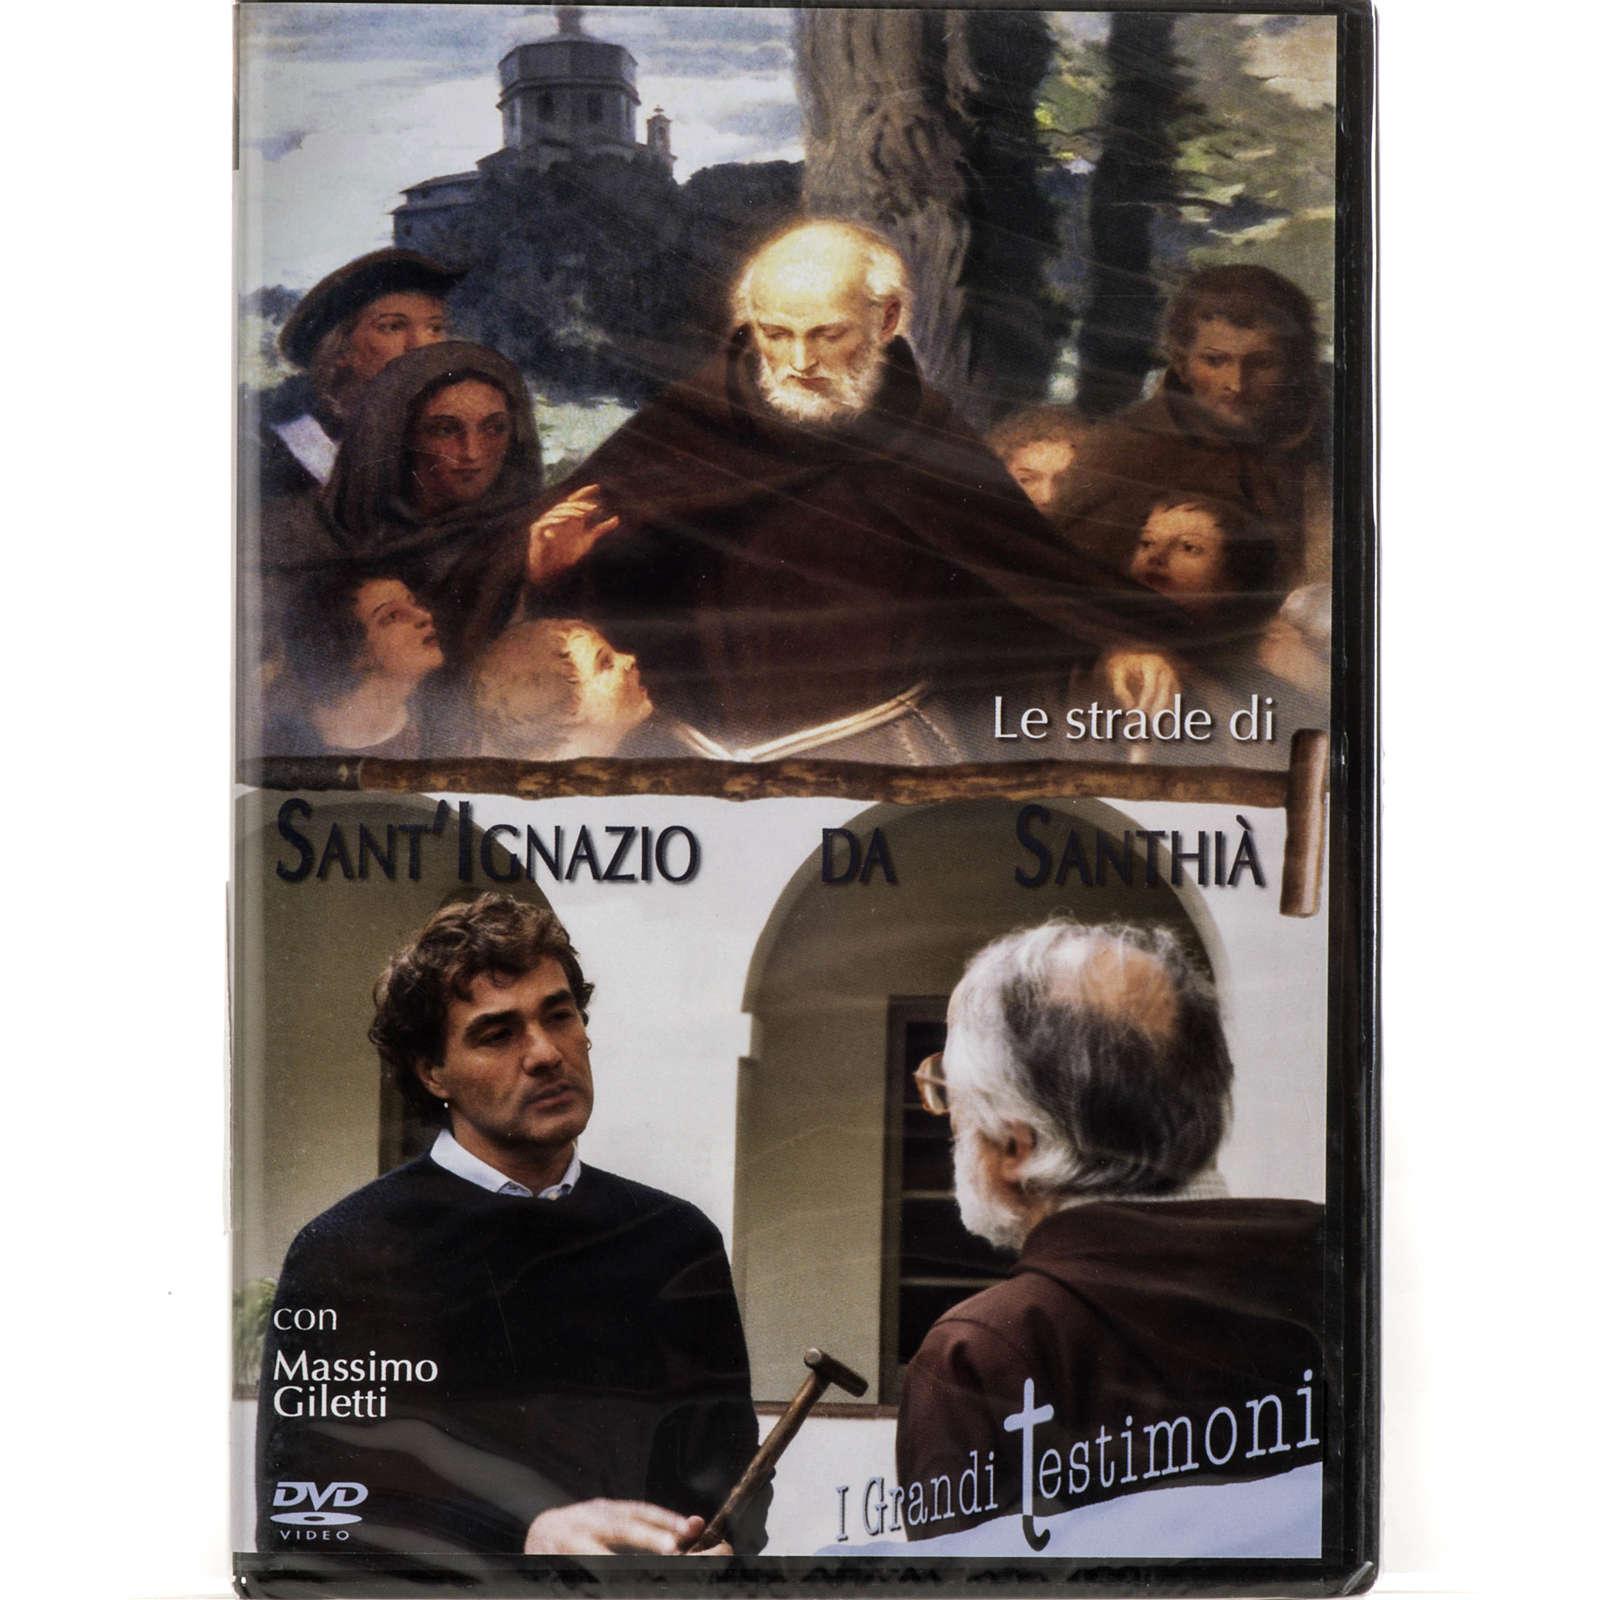 Sant'Ignazio di Santhià 3